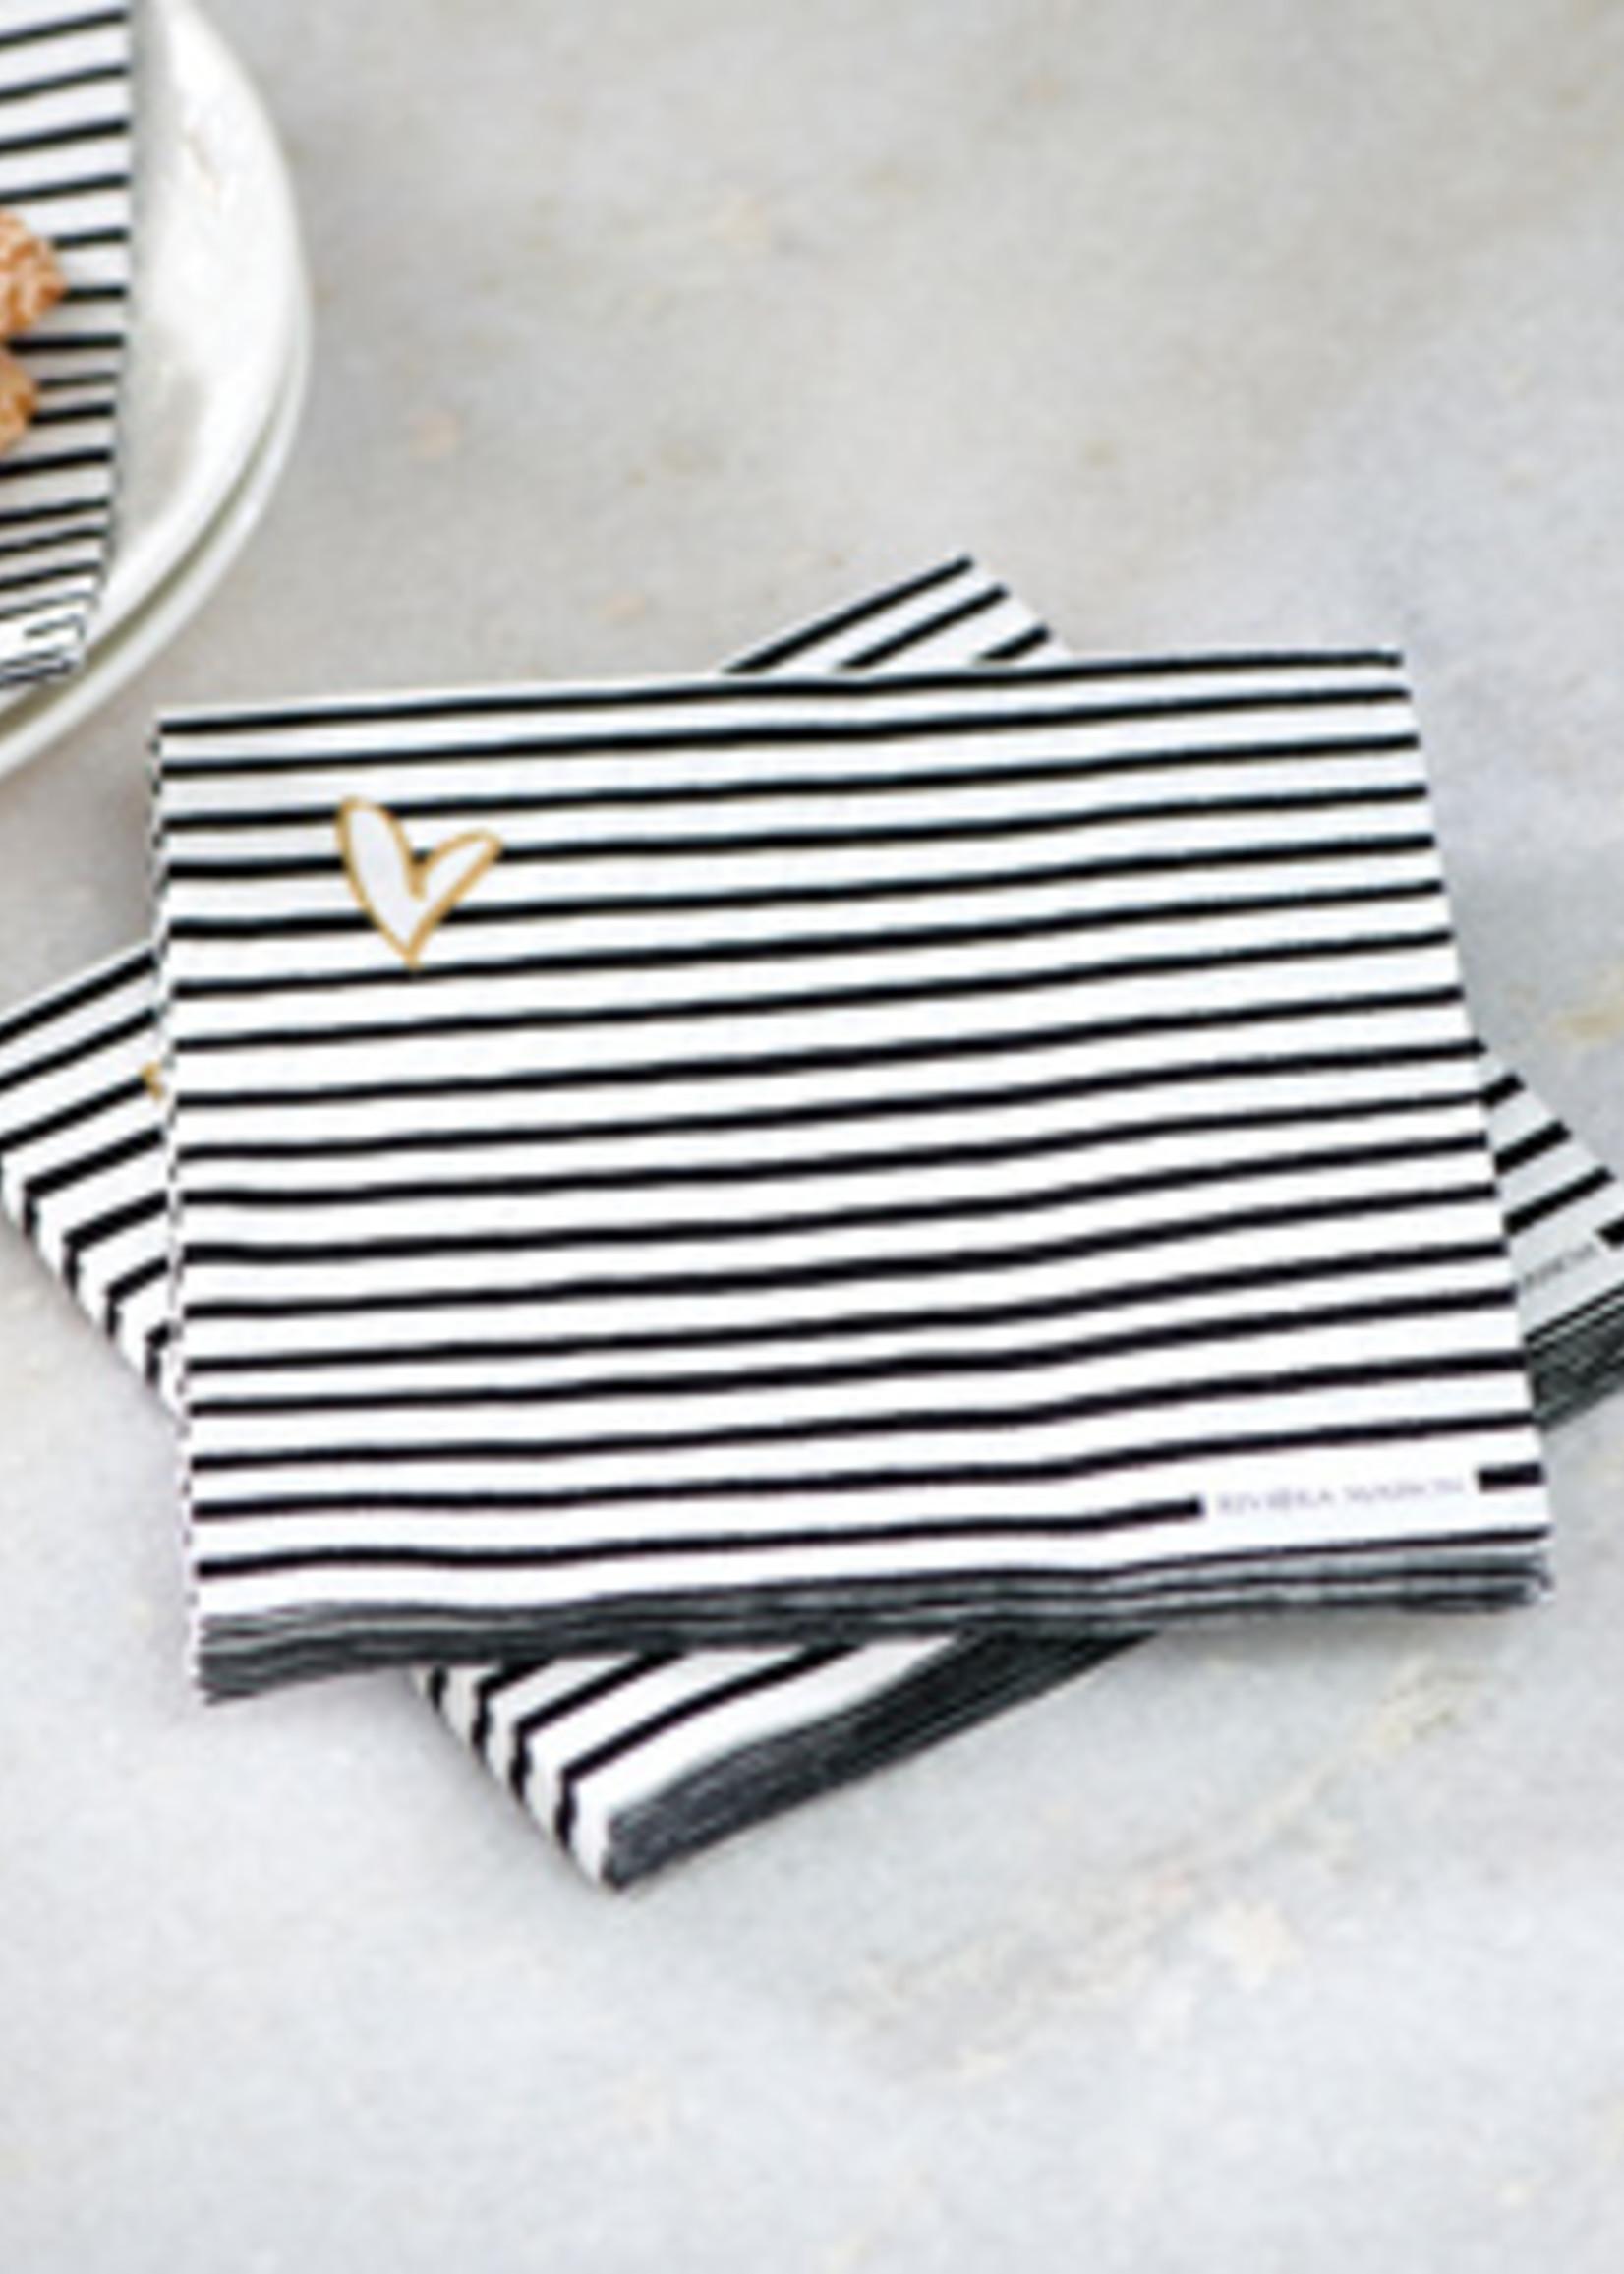 Riviera Maison Paper Napkin RM Dots & Stripes